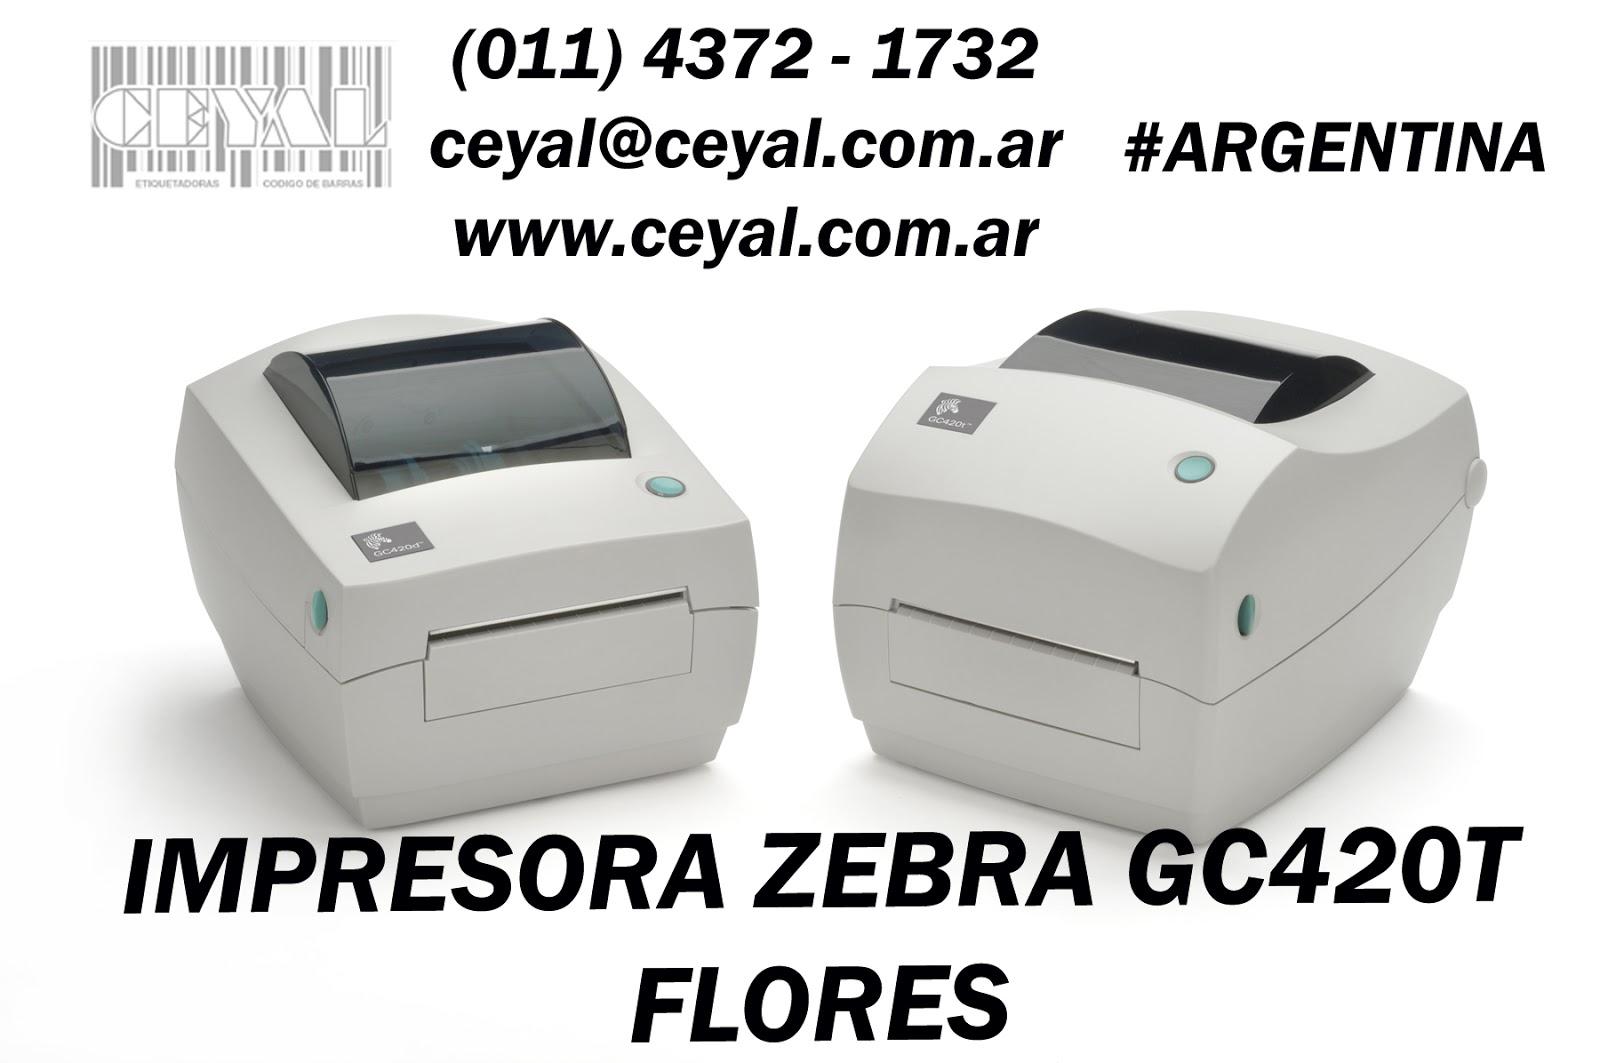 Cabezal Semi Industrial zebra Bs As Argentina